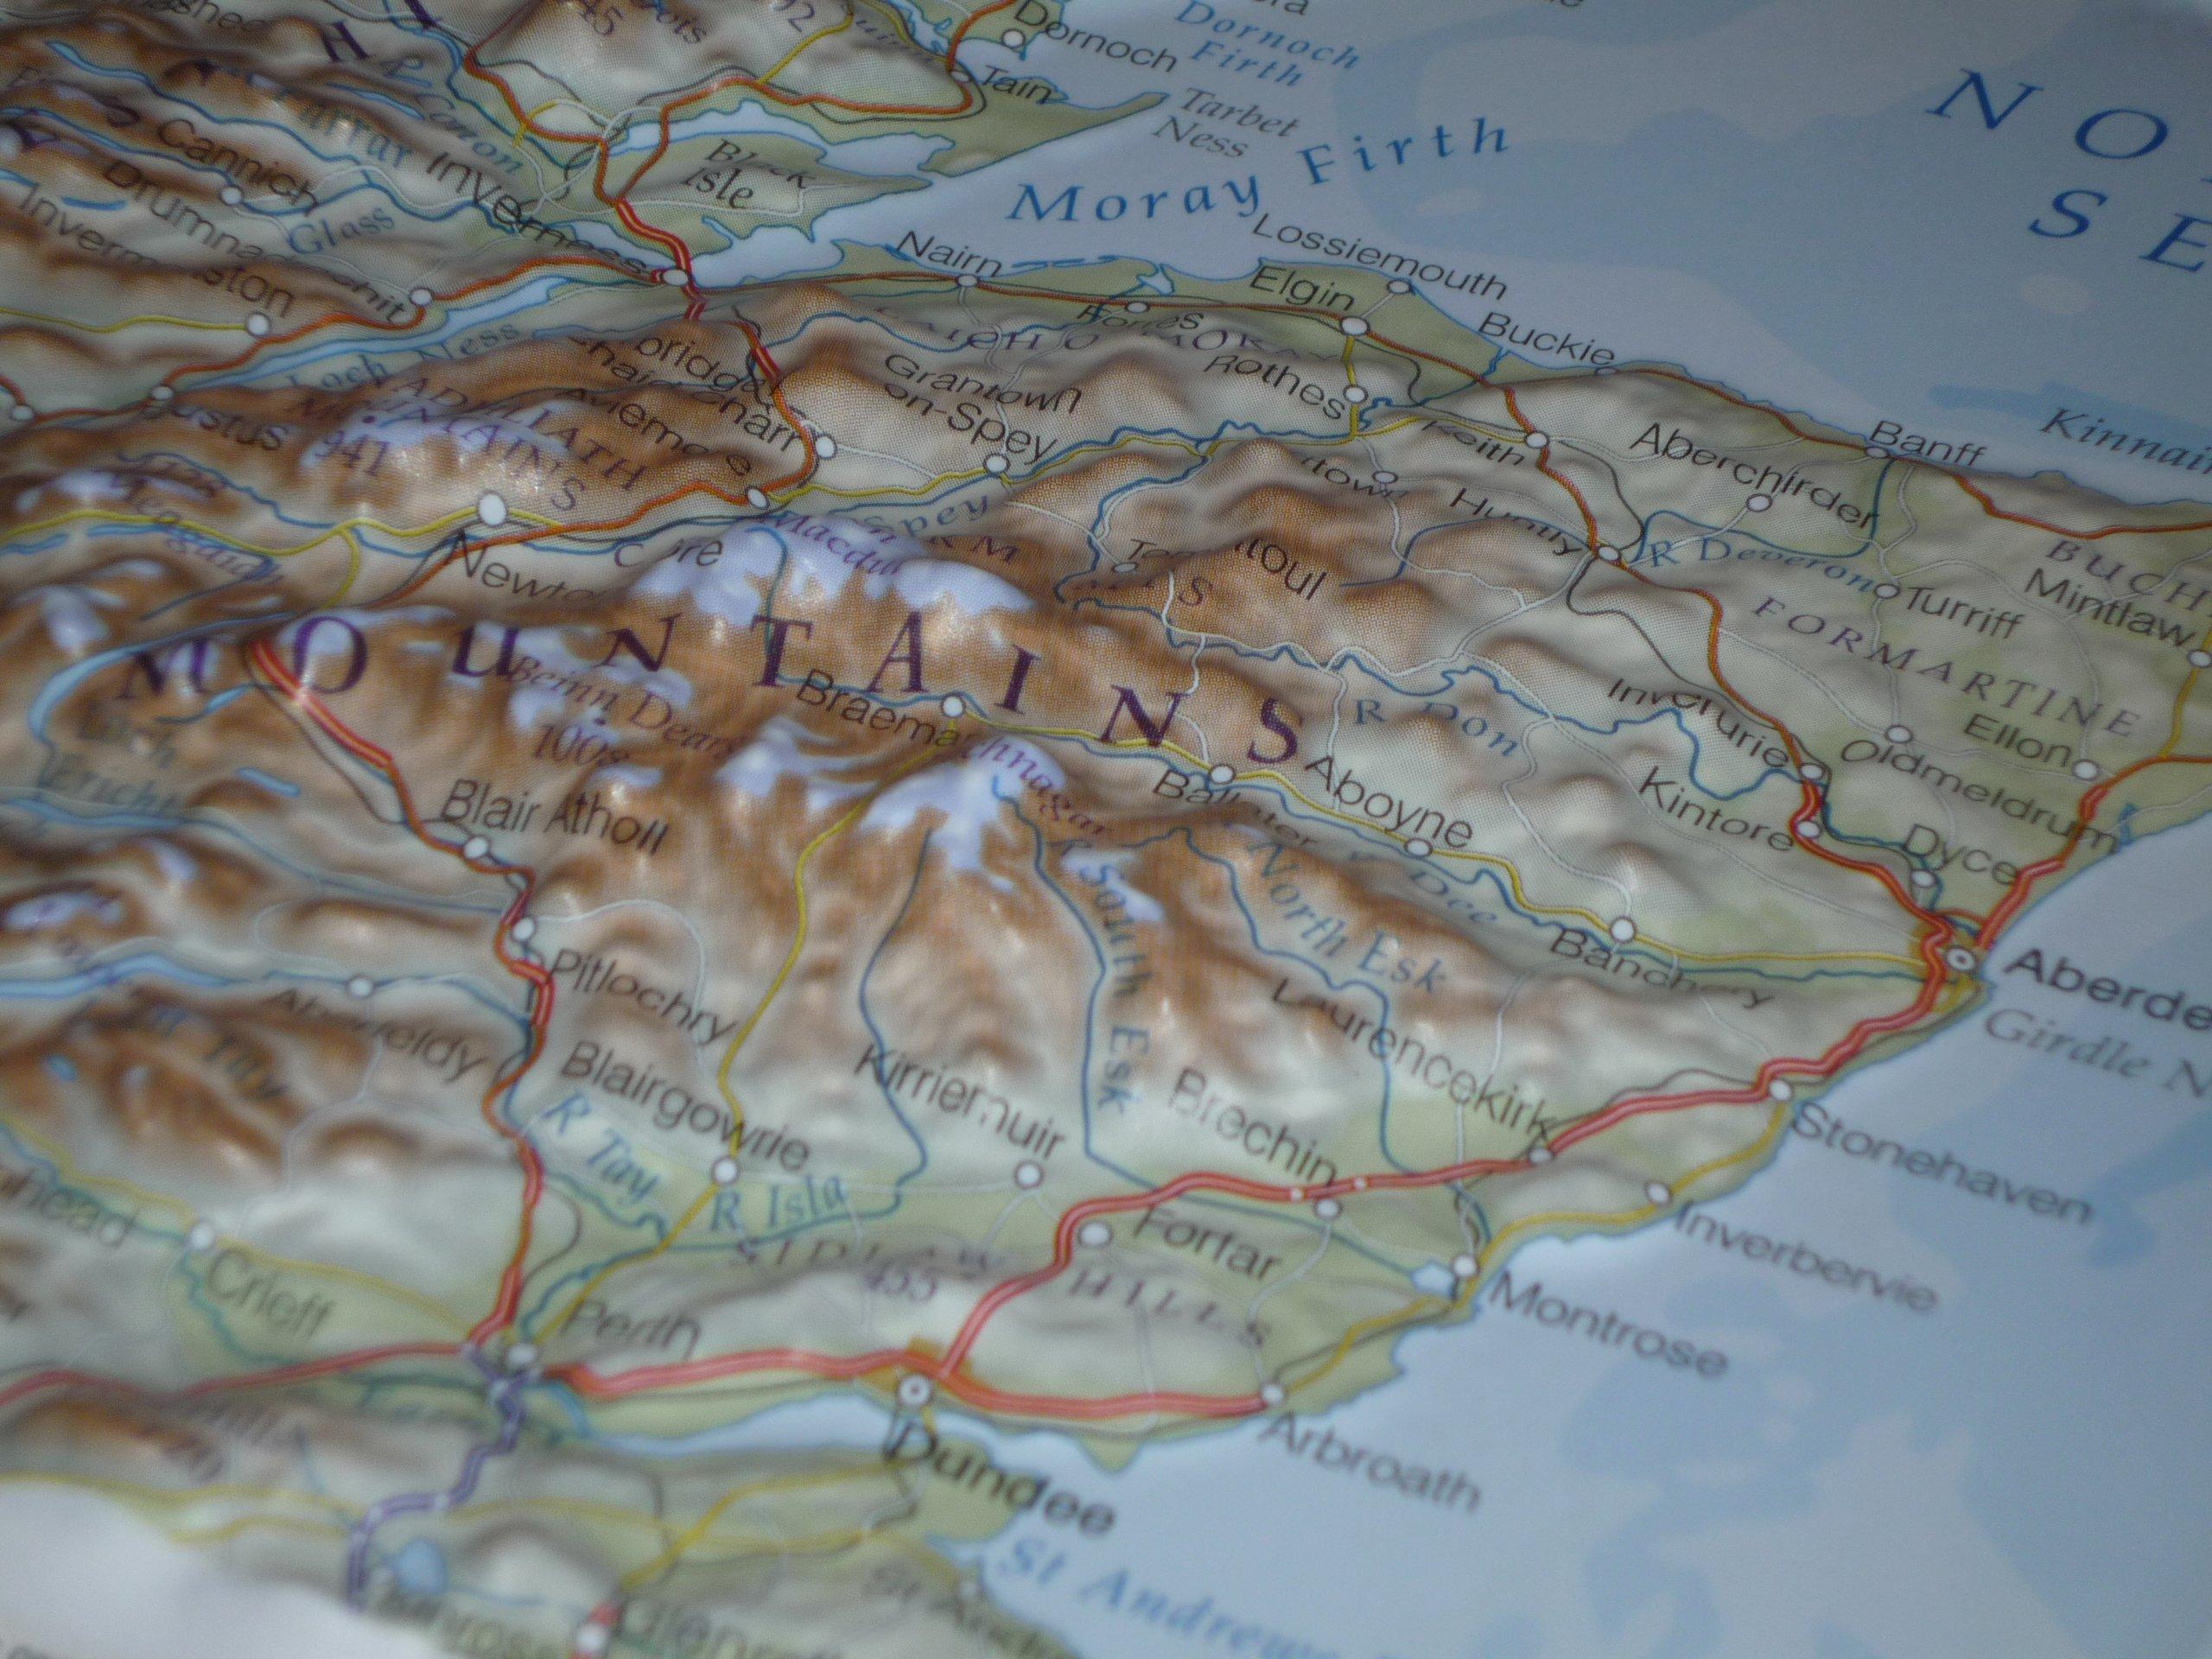 Dorrigo North Scotland Framed Raised Relief Map Amazoncouk - Raised relief map